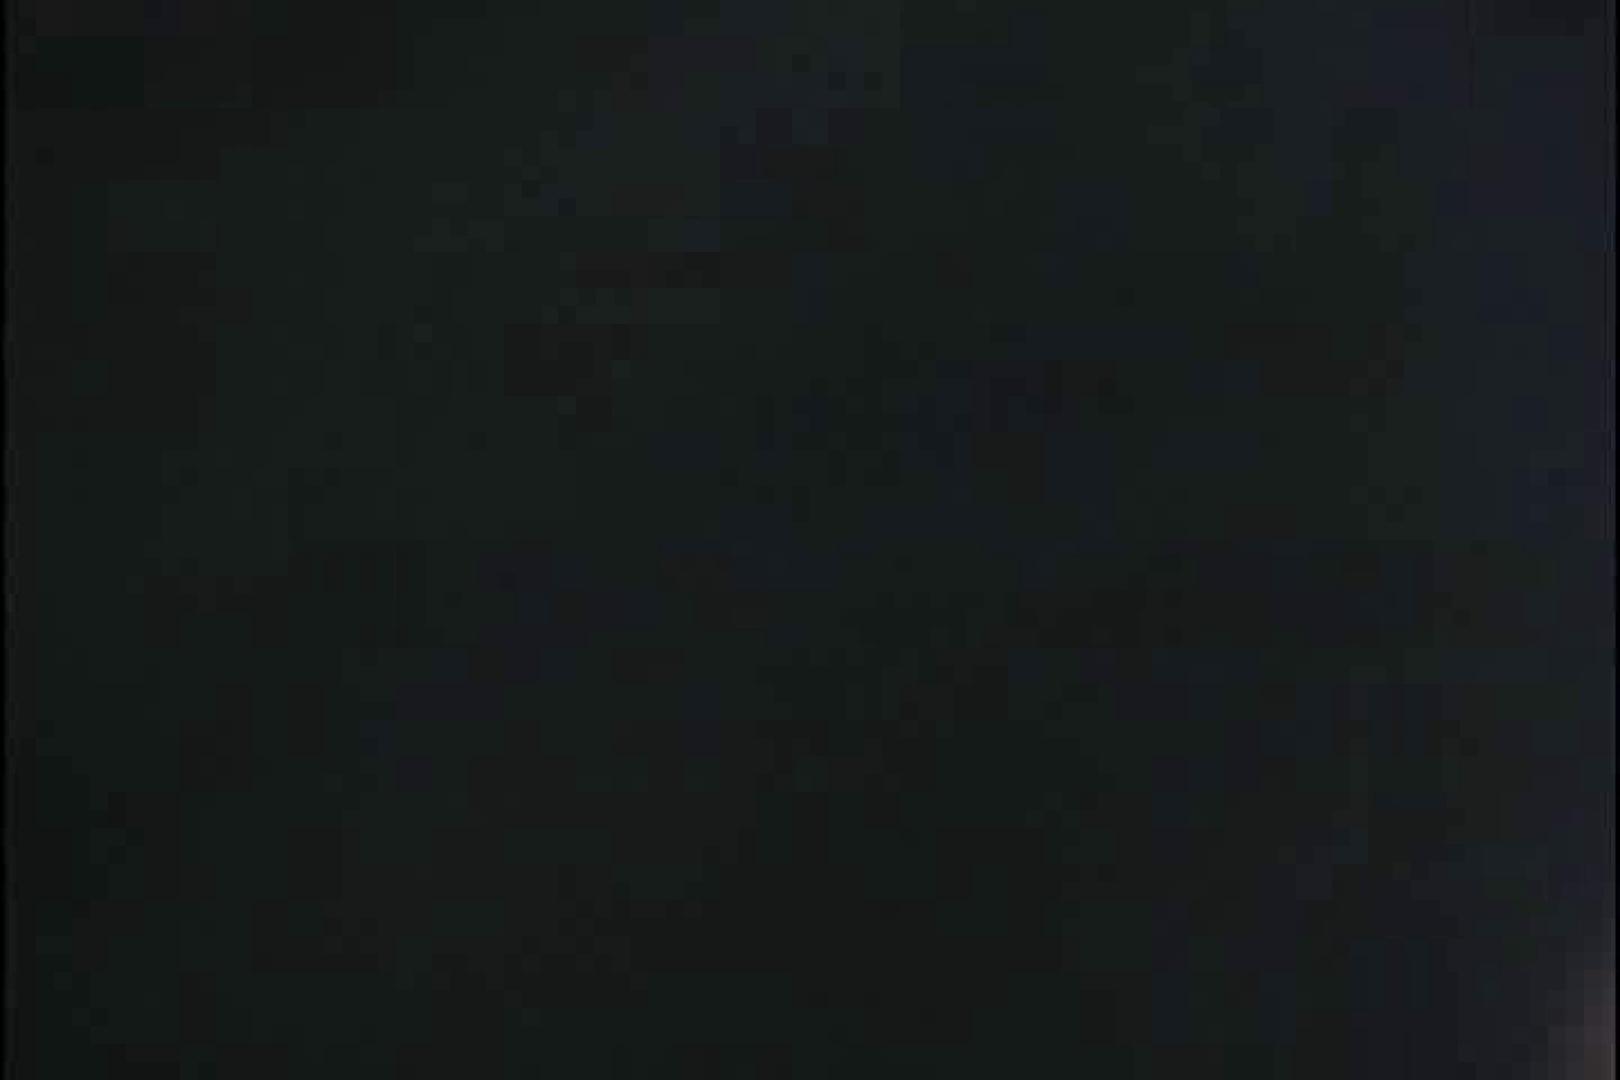 RQカメラ地獄Vol.13 OL  67枚 67